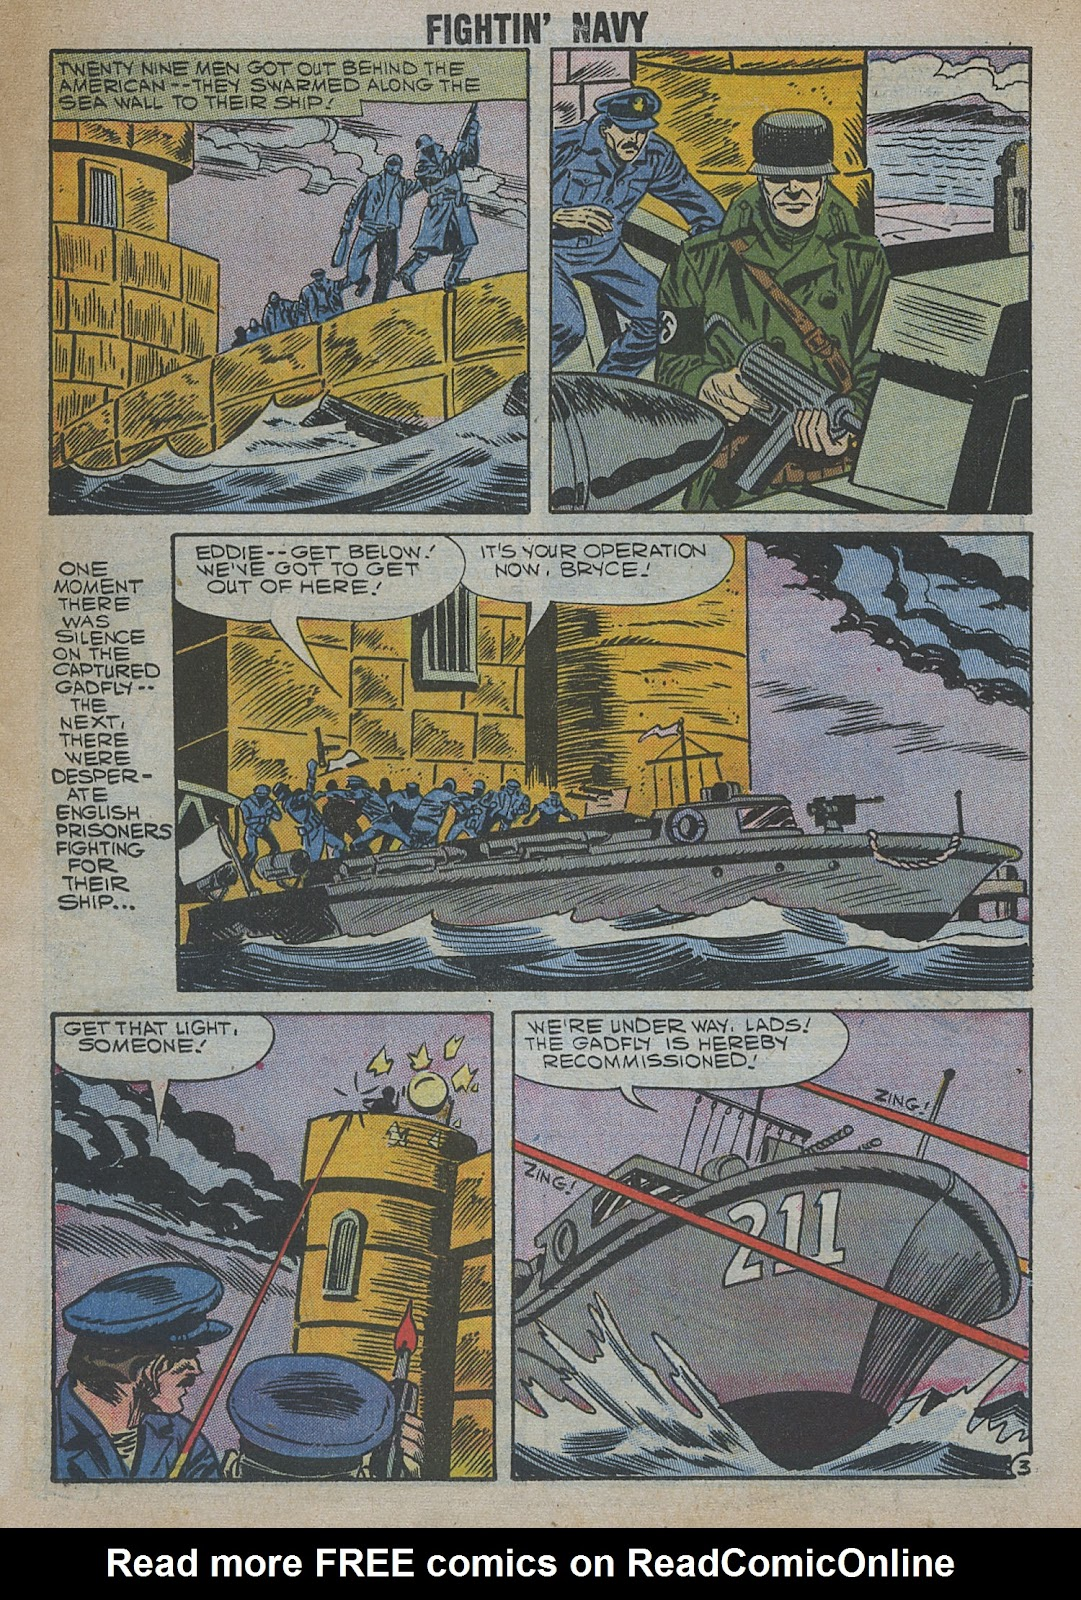 Read online Fightin' Navy comic -  Issue #82 - 19